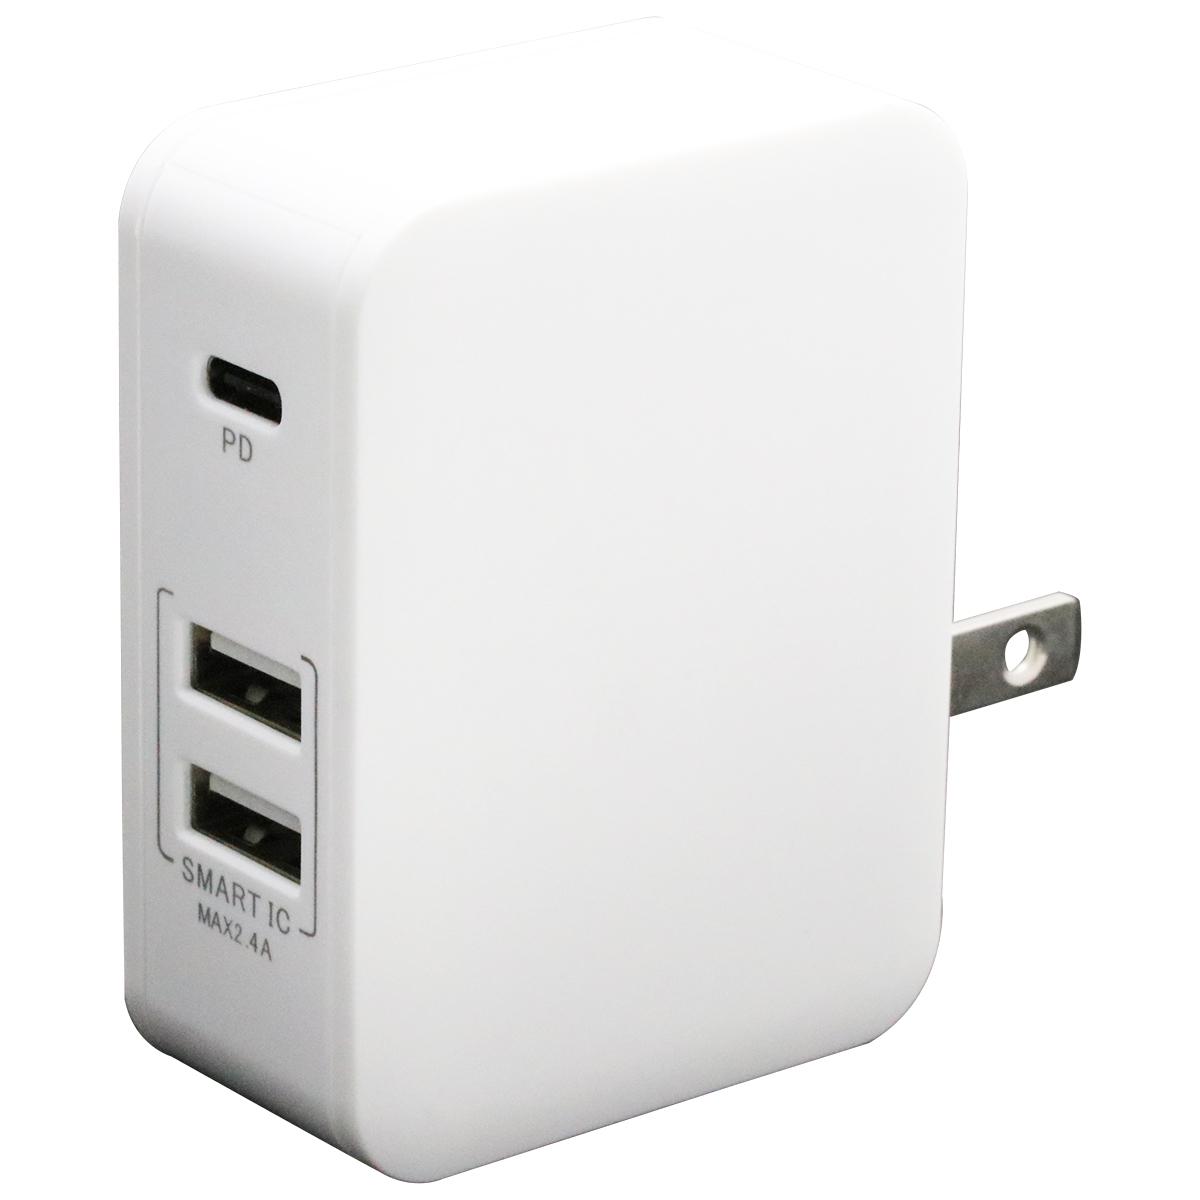 PD対応Type-C/2USBポートAC充電器32W